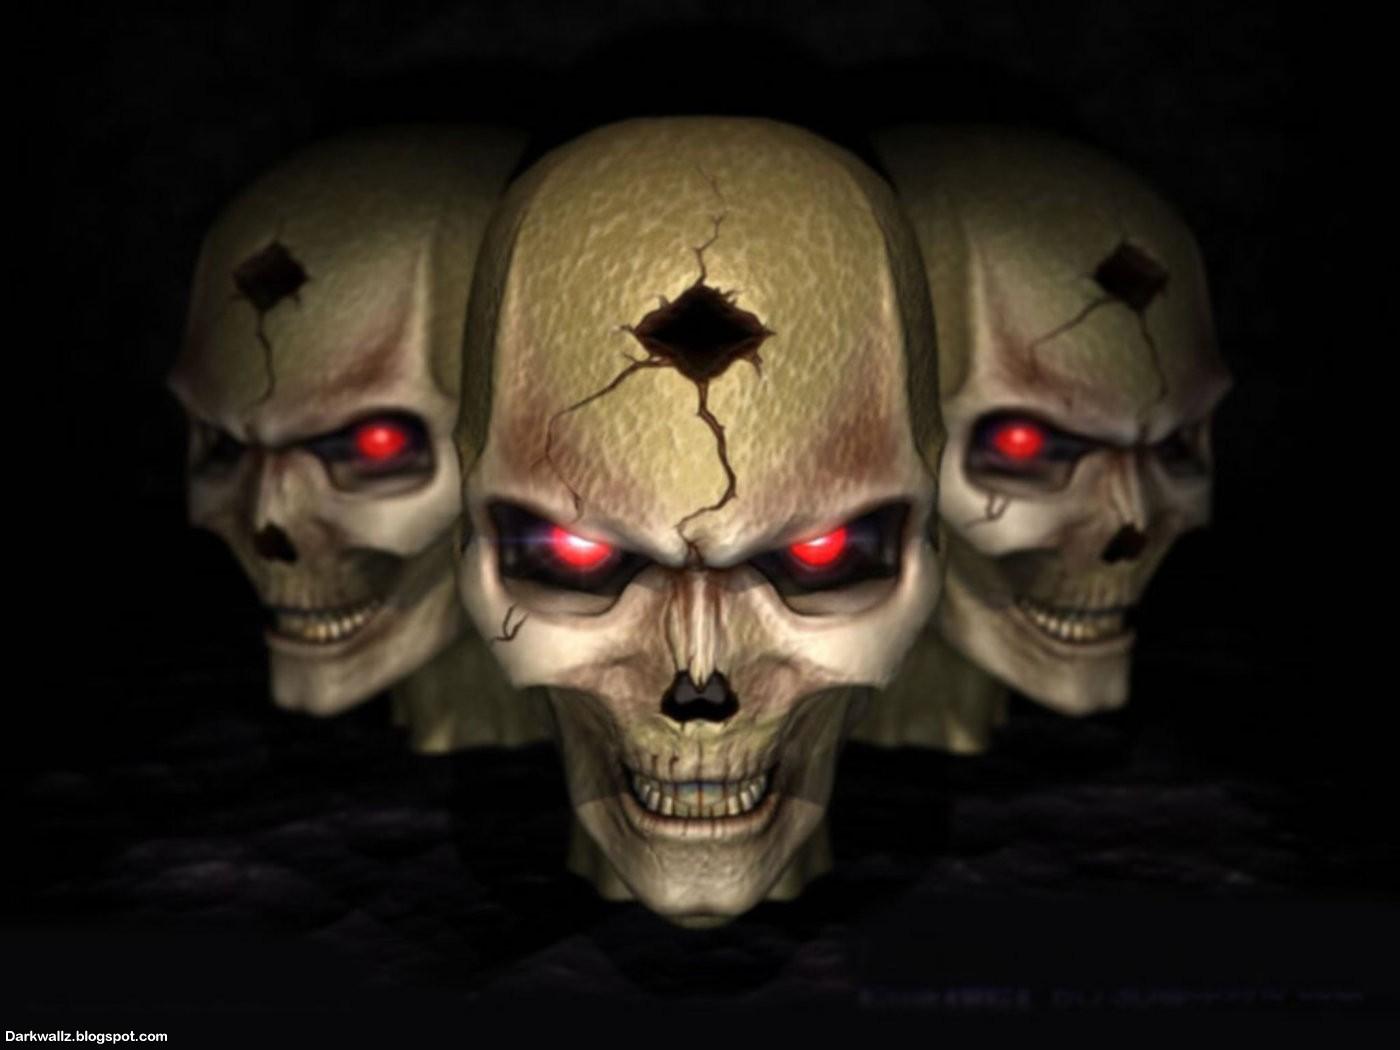 Gothic Skull Wallpaper